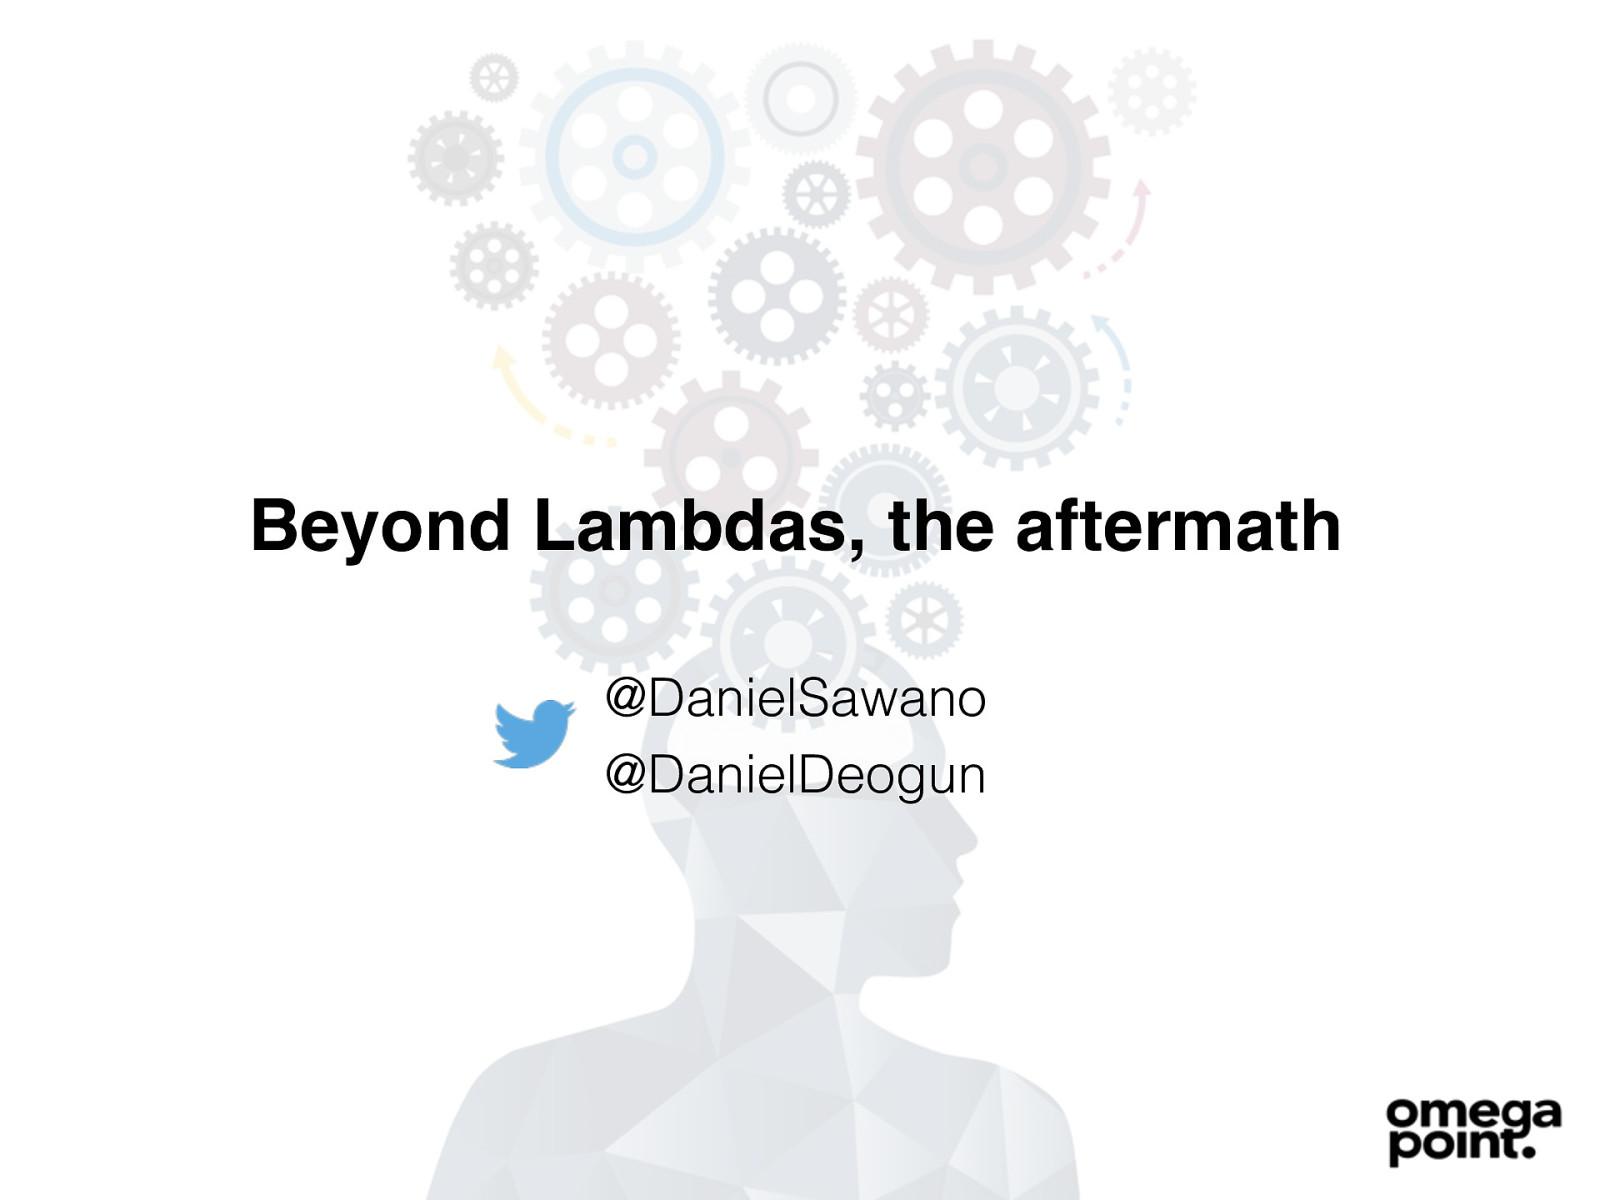 Beyond Lambdas - the Aftermath